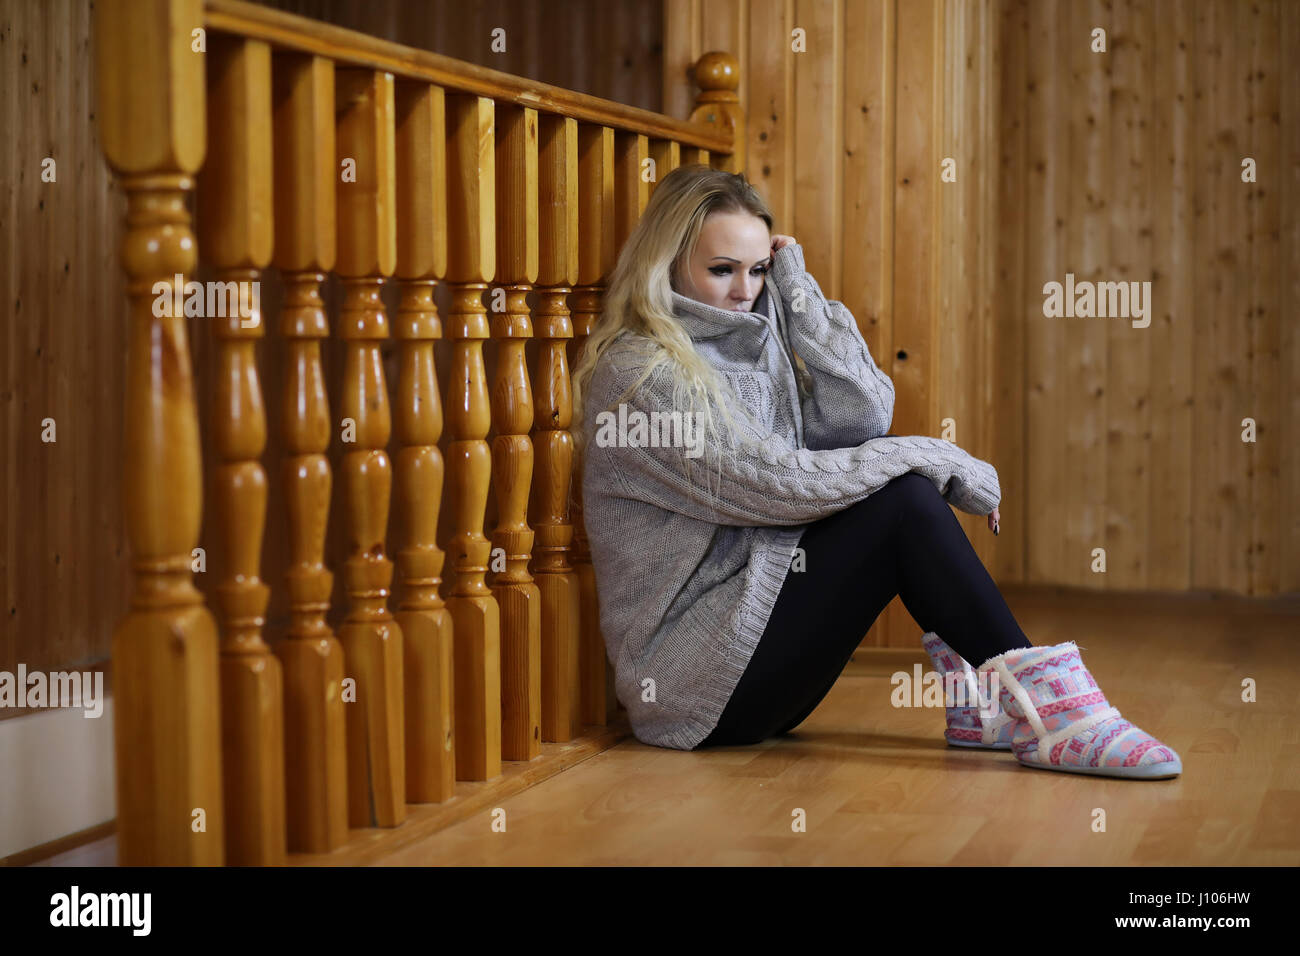 girl sitting on the floor near the wooden railing Stock Photo